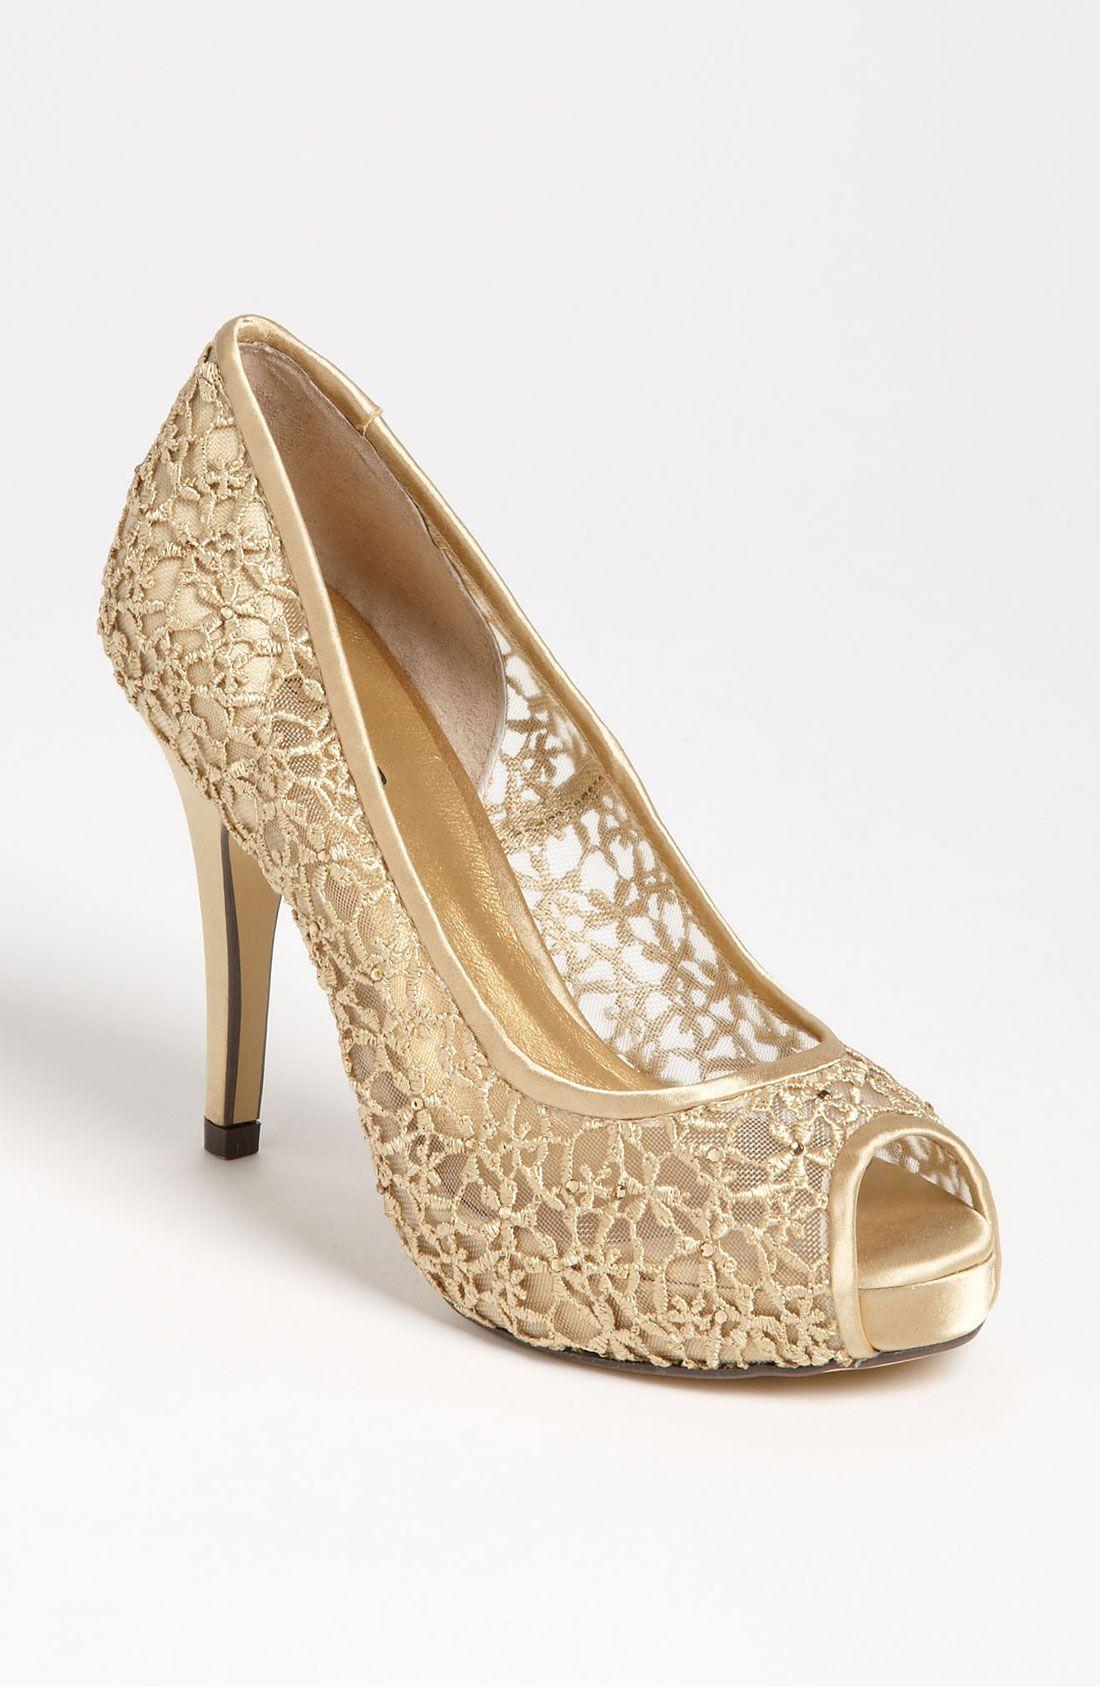 Strass Pump Gold Bridesmaid ShoesGold